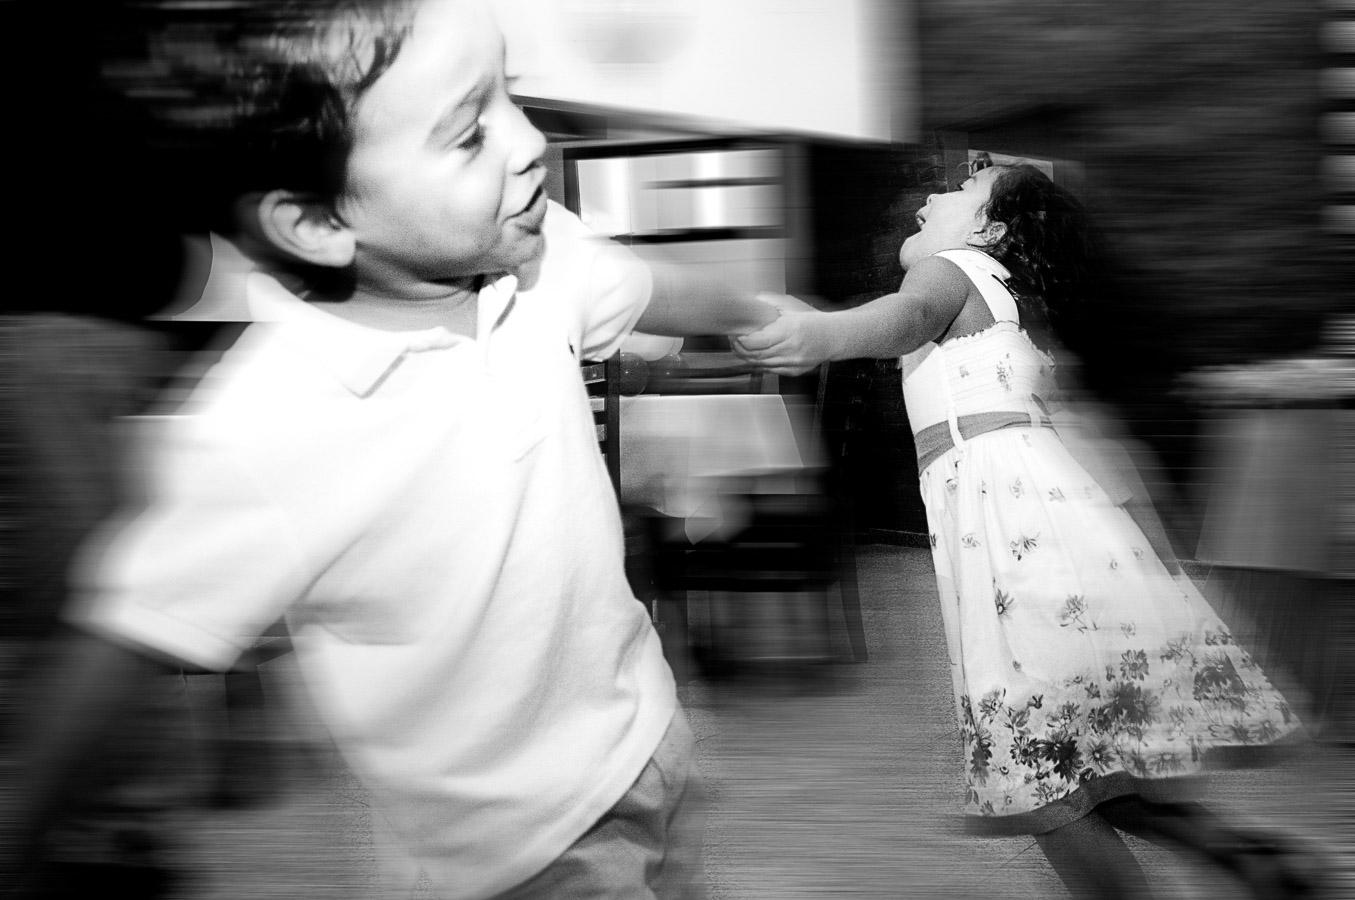 fotografia 2017 07 19 01 16 44 457673 home dancing Home fotografo